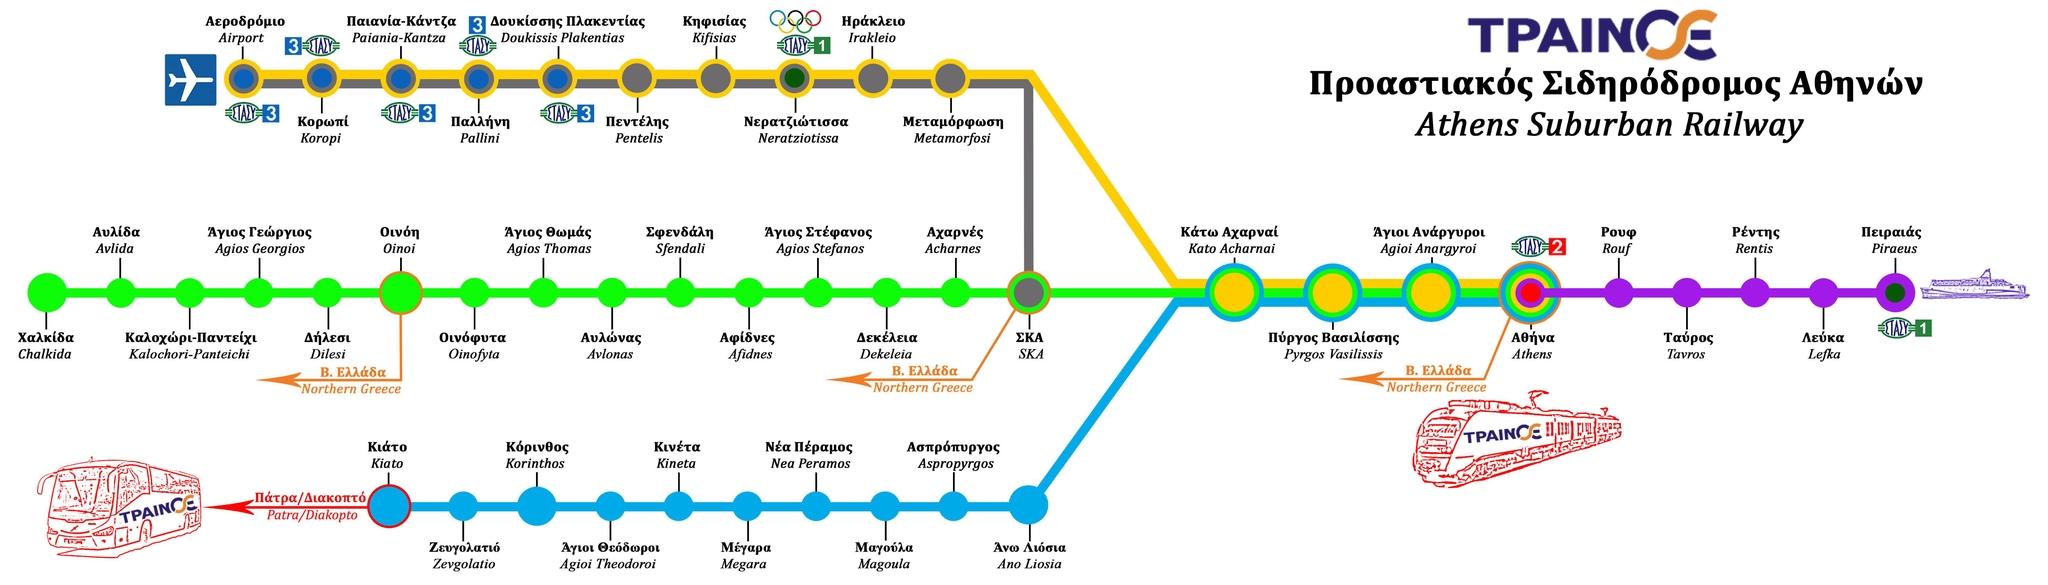 Proasiakos stations map